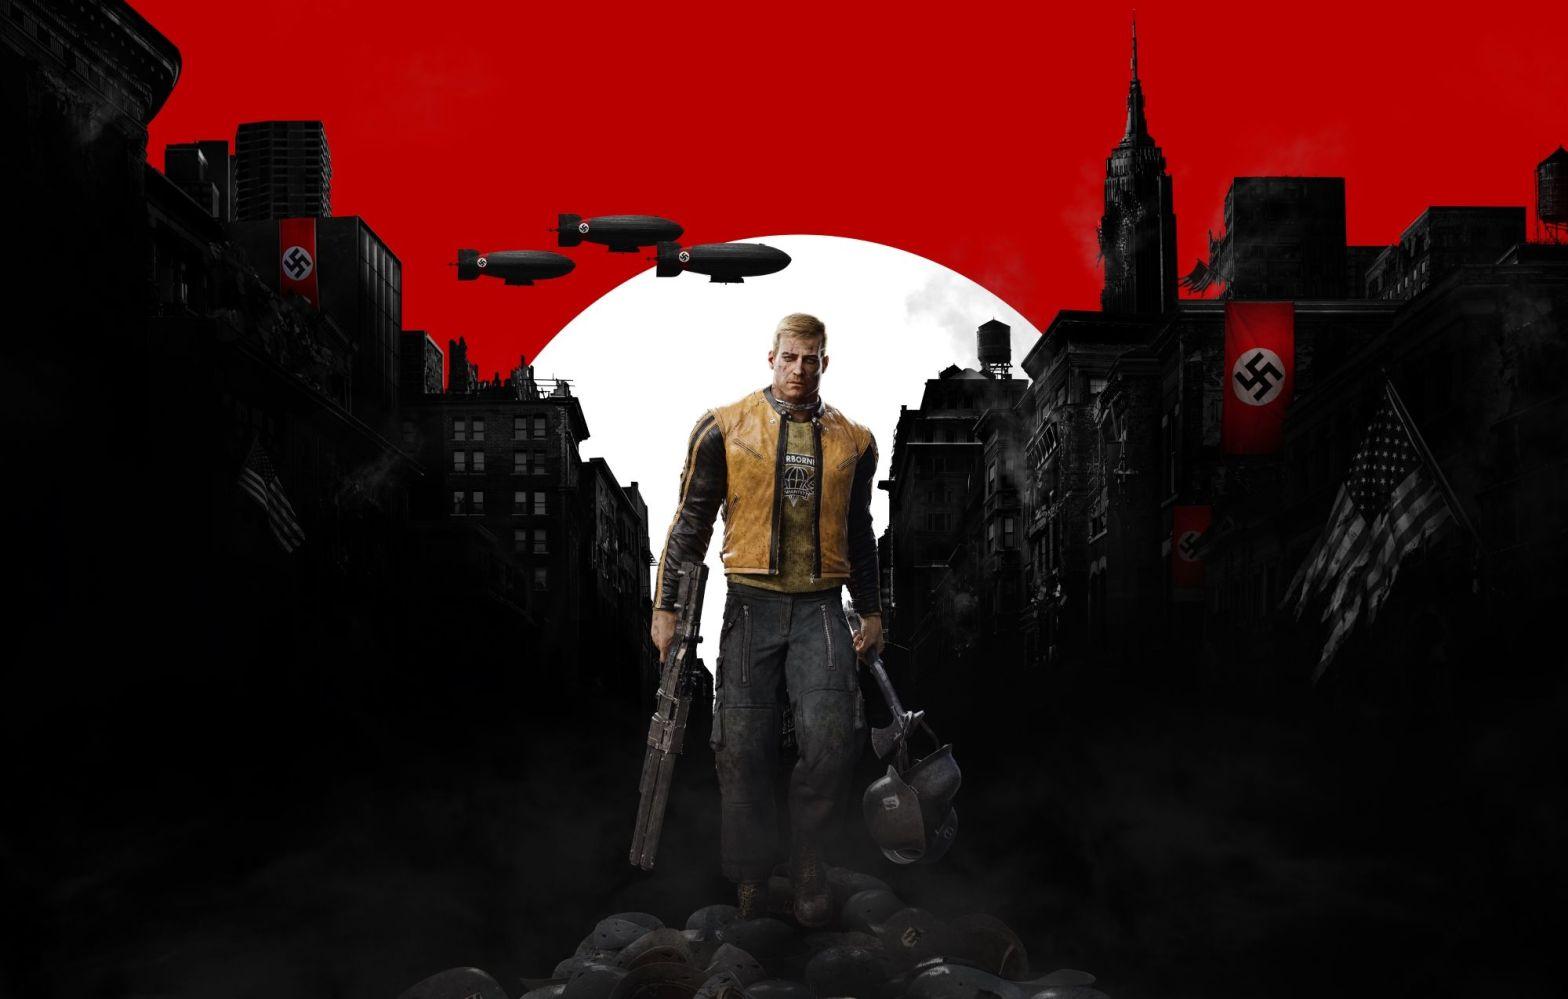 Wolfenstein 2: The New Colossus, Games, Online Games, Video Games